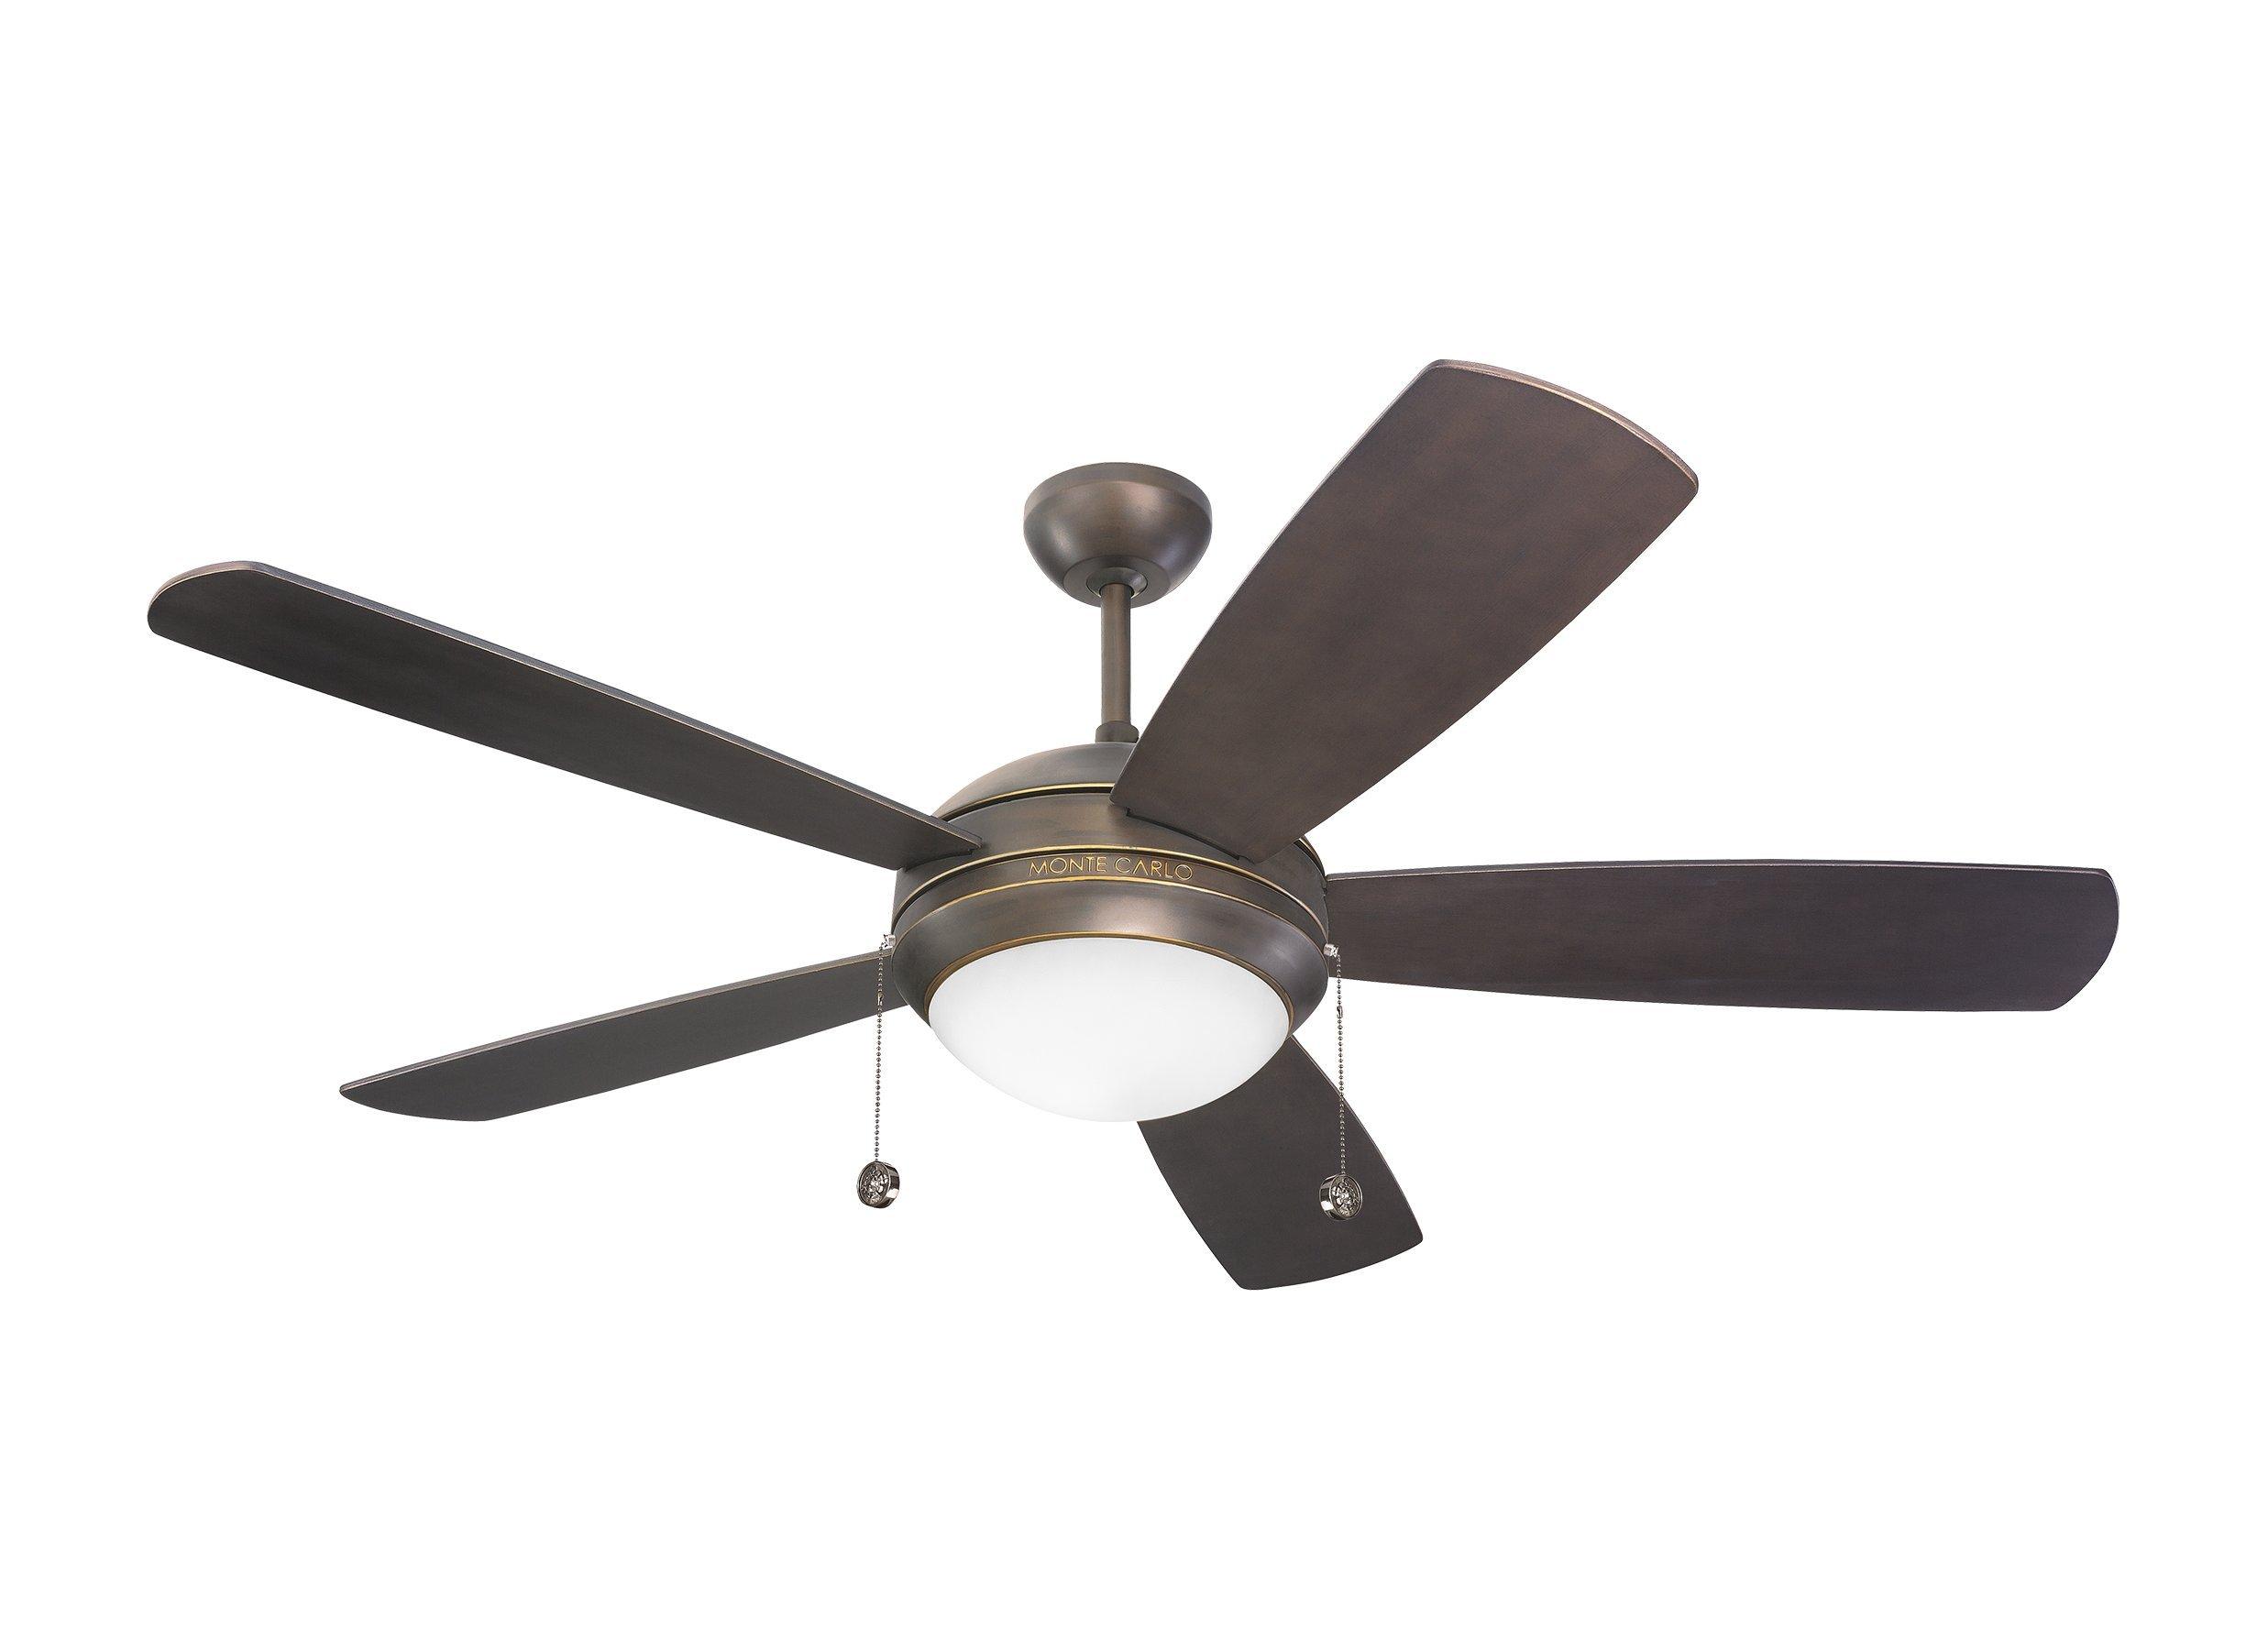 Monte Carlo 5DI52RBD-L, Discus,  52'' Ceiling Fan,  Roman Bronze